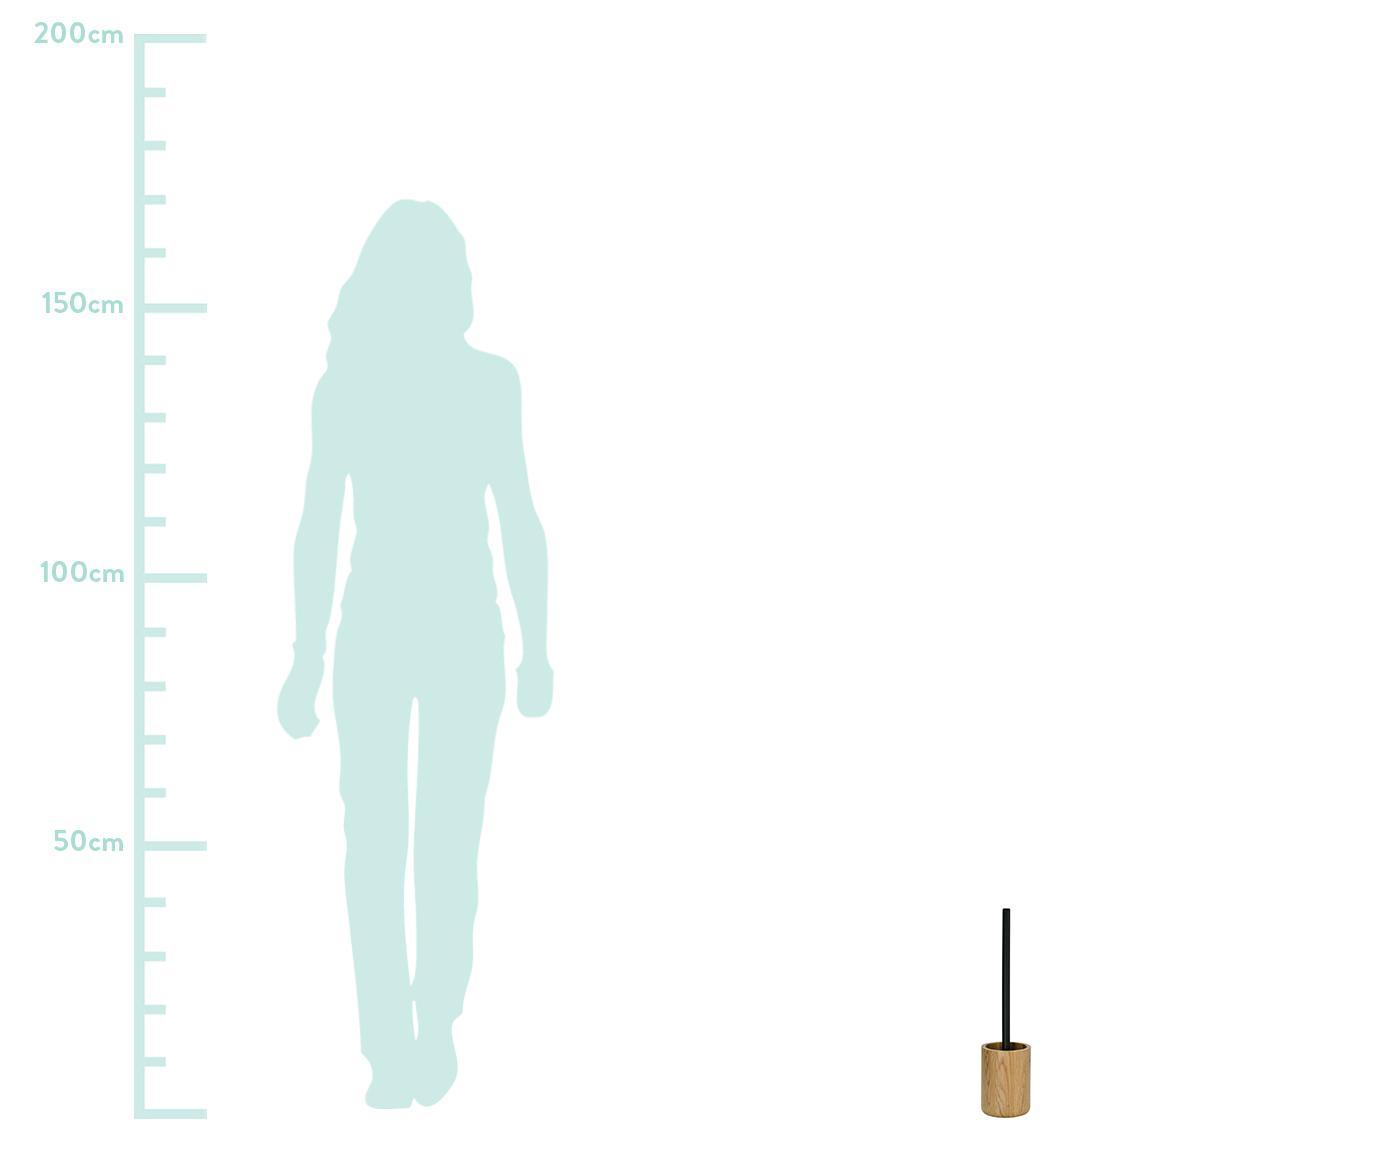 Toilettenbürste Erwin mit Eichenholz-Behälter, Behälter: Eichenholz, Griff: Edelstahl, lackiert, Eichenholz, Edelstahl, Ø 10 x H 39 cm